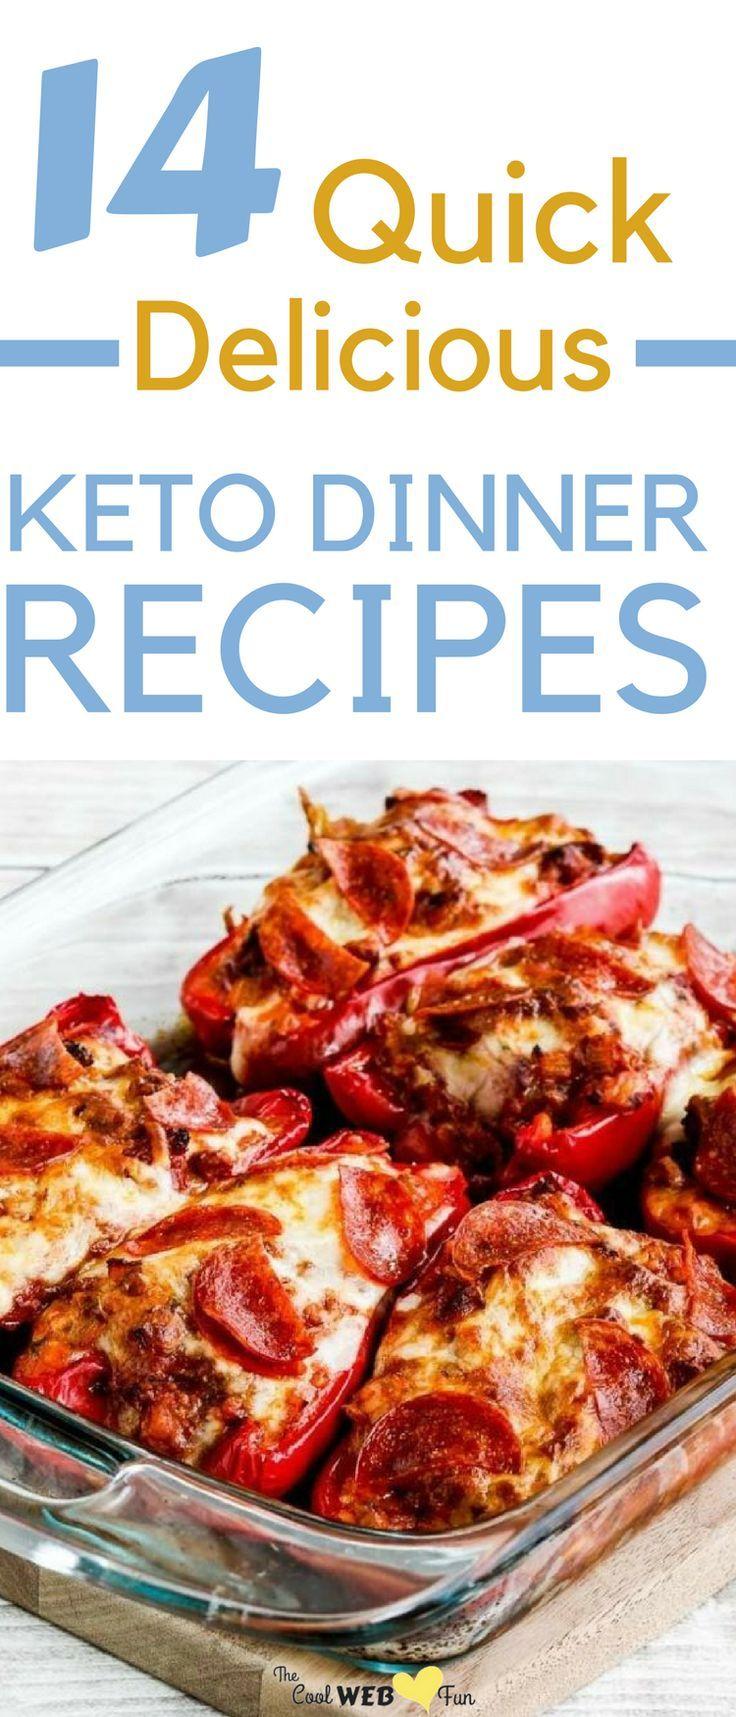 Keto Dinner: 14 Simple + Quick Keto Dinner Recipes to make Tonight